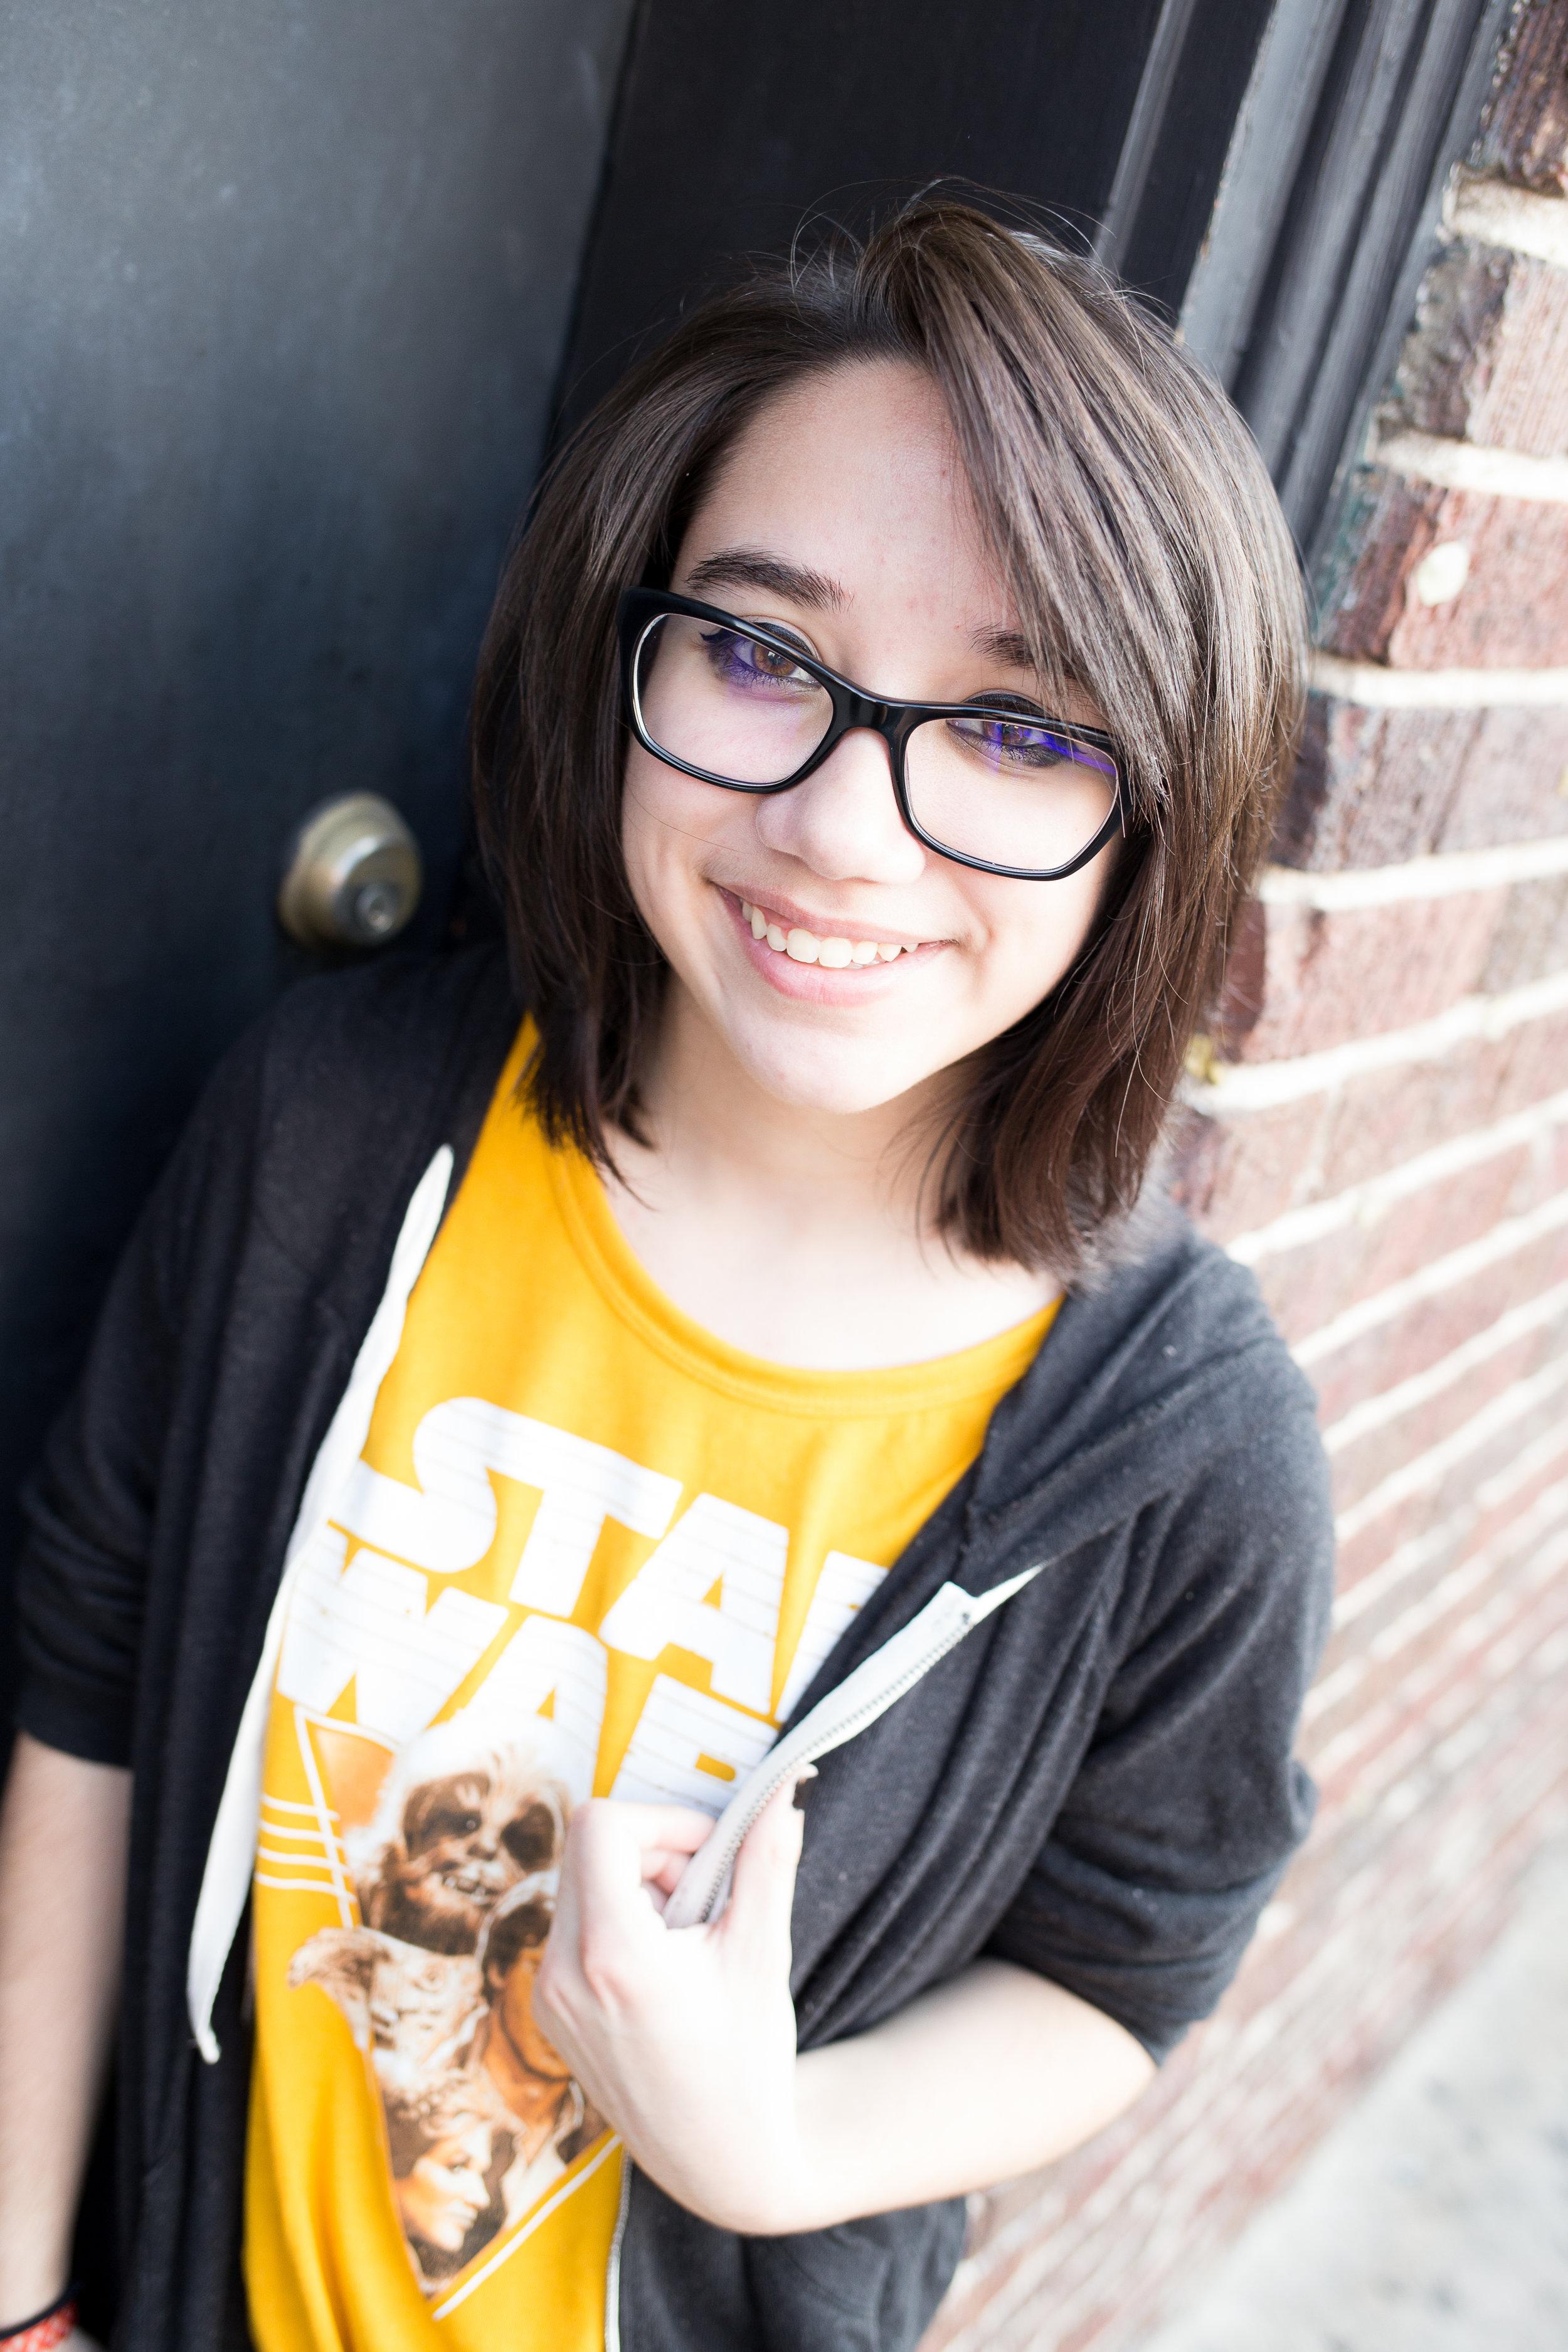 Colorado Springs Senior Photography | Colorado Springs Senior Photographer | Girl yellow shirt smiling at camera for senior portraits | Stacy Carosa Photography